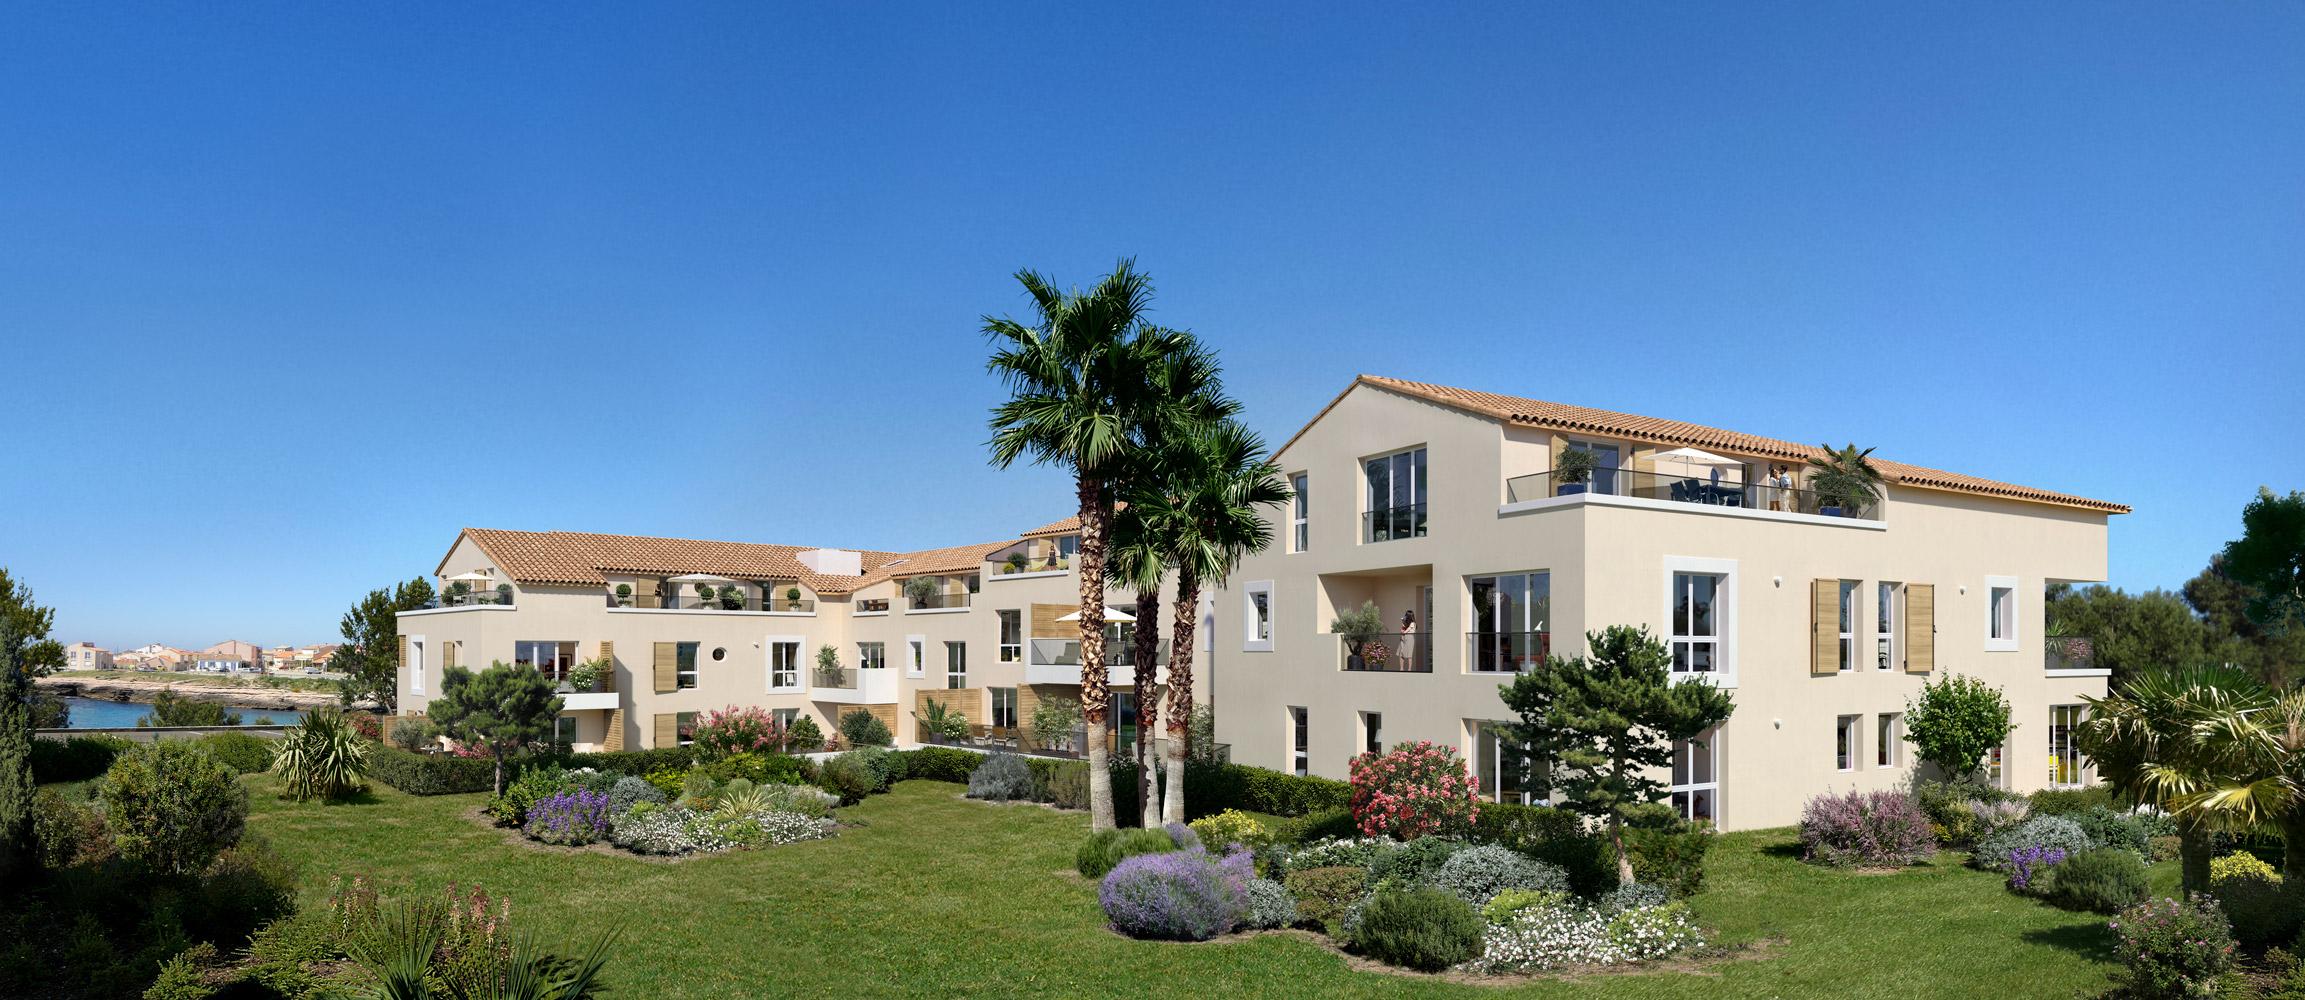 RESIDENCE GRAND LARGE - 32 logements